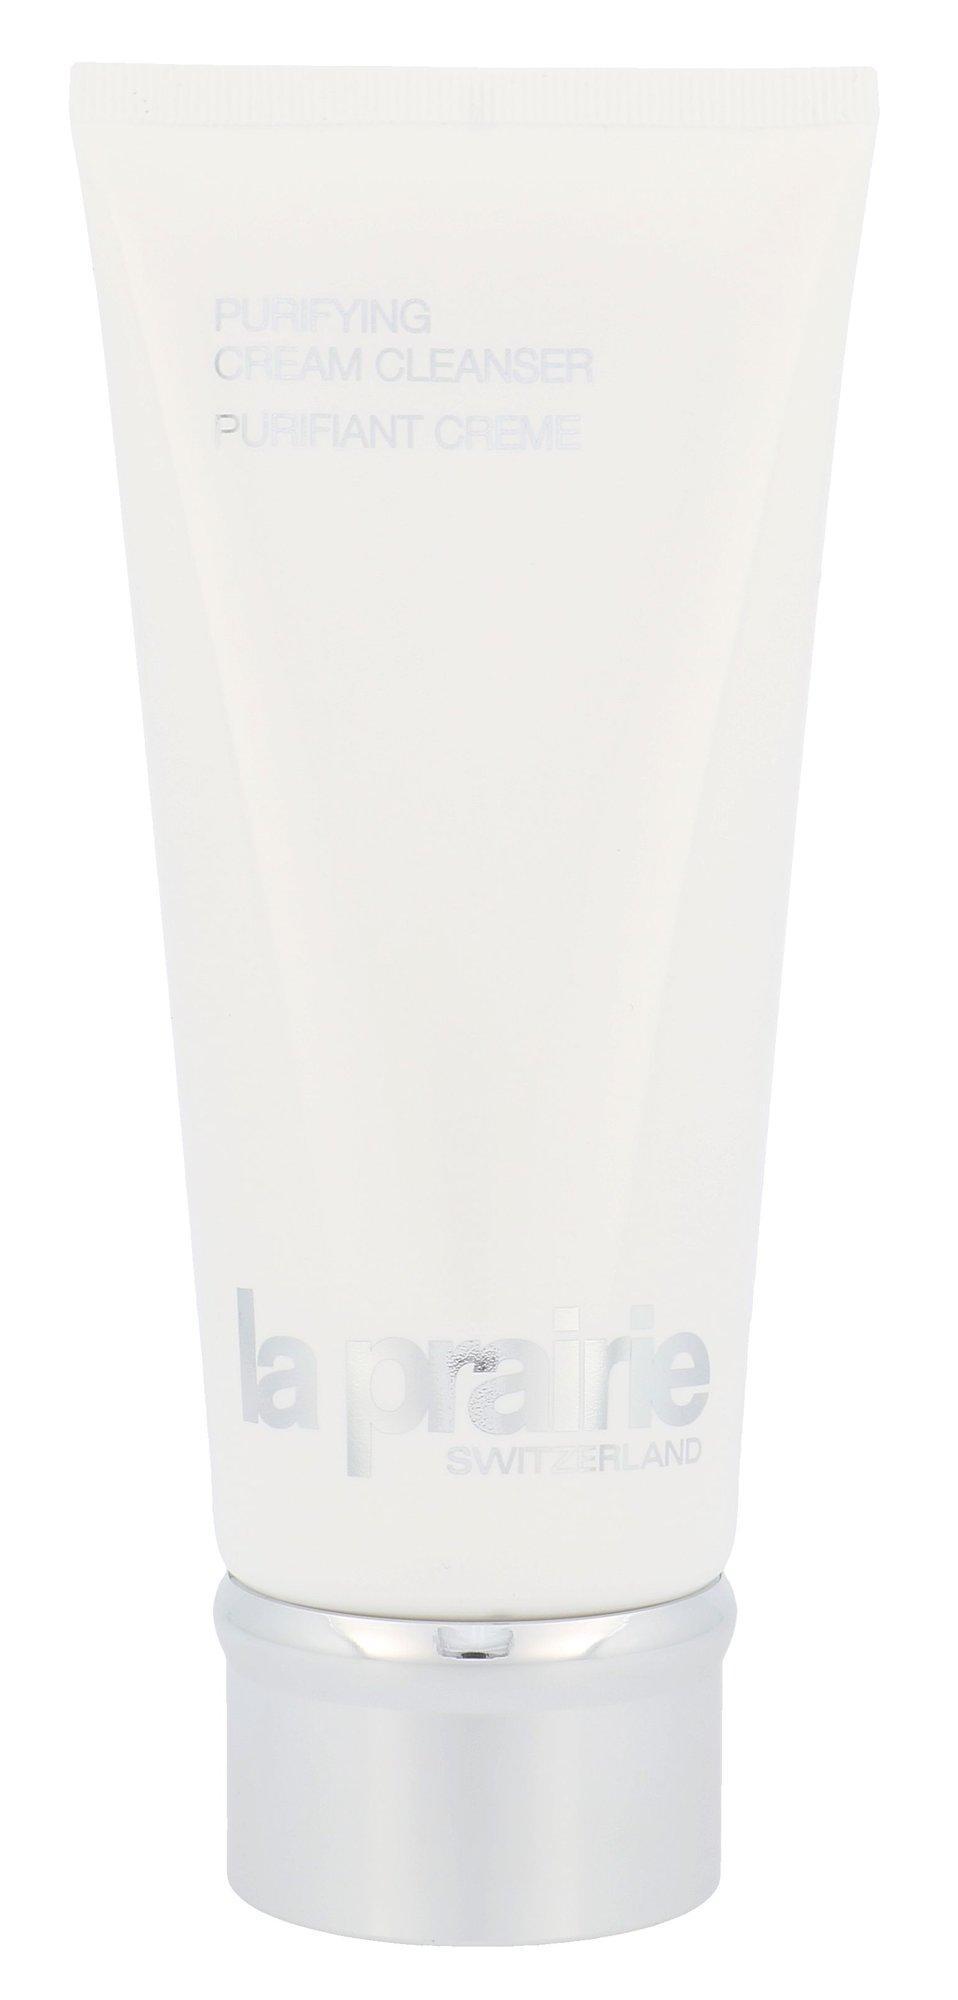 La Prairie Purifying Cream Cleanser Cosmetic 200ml